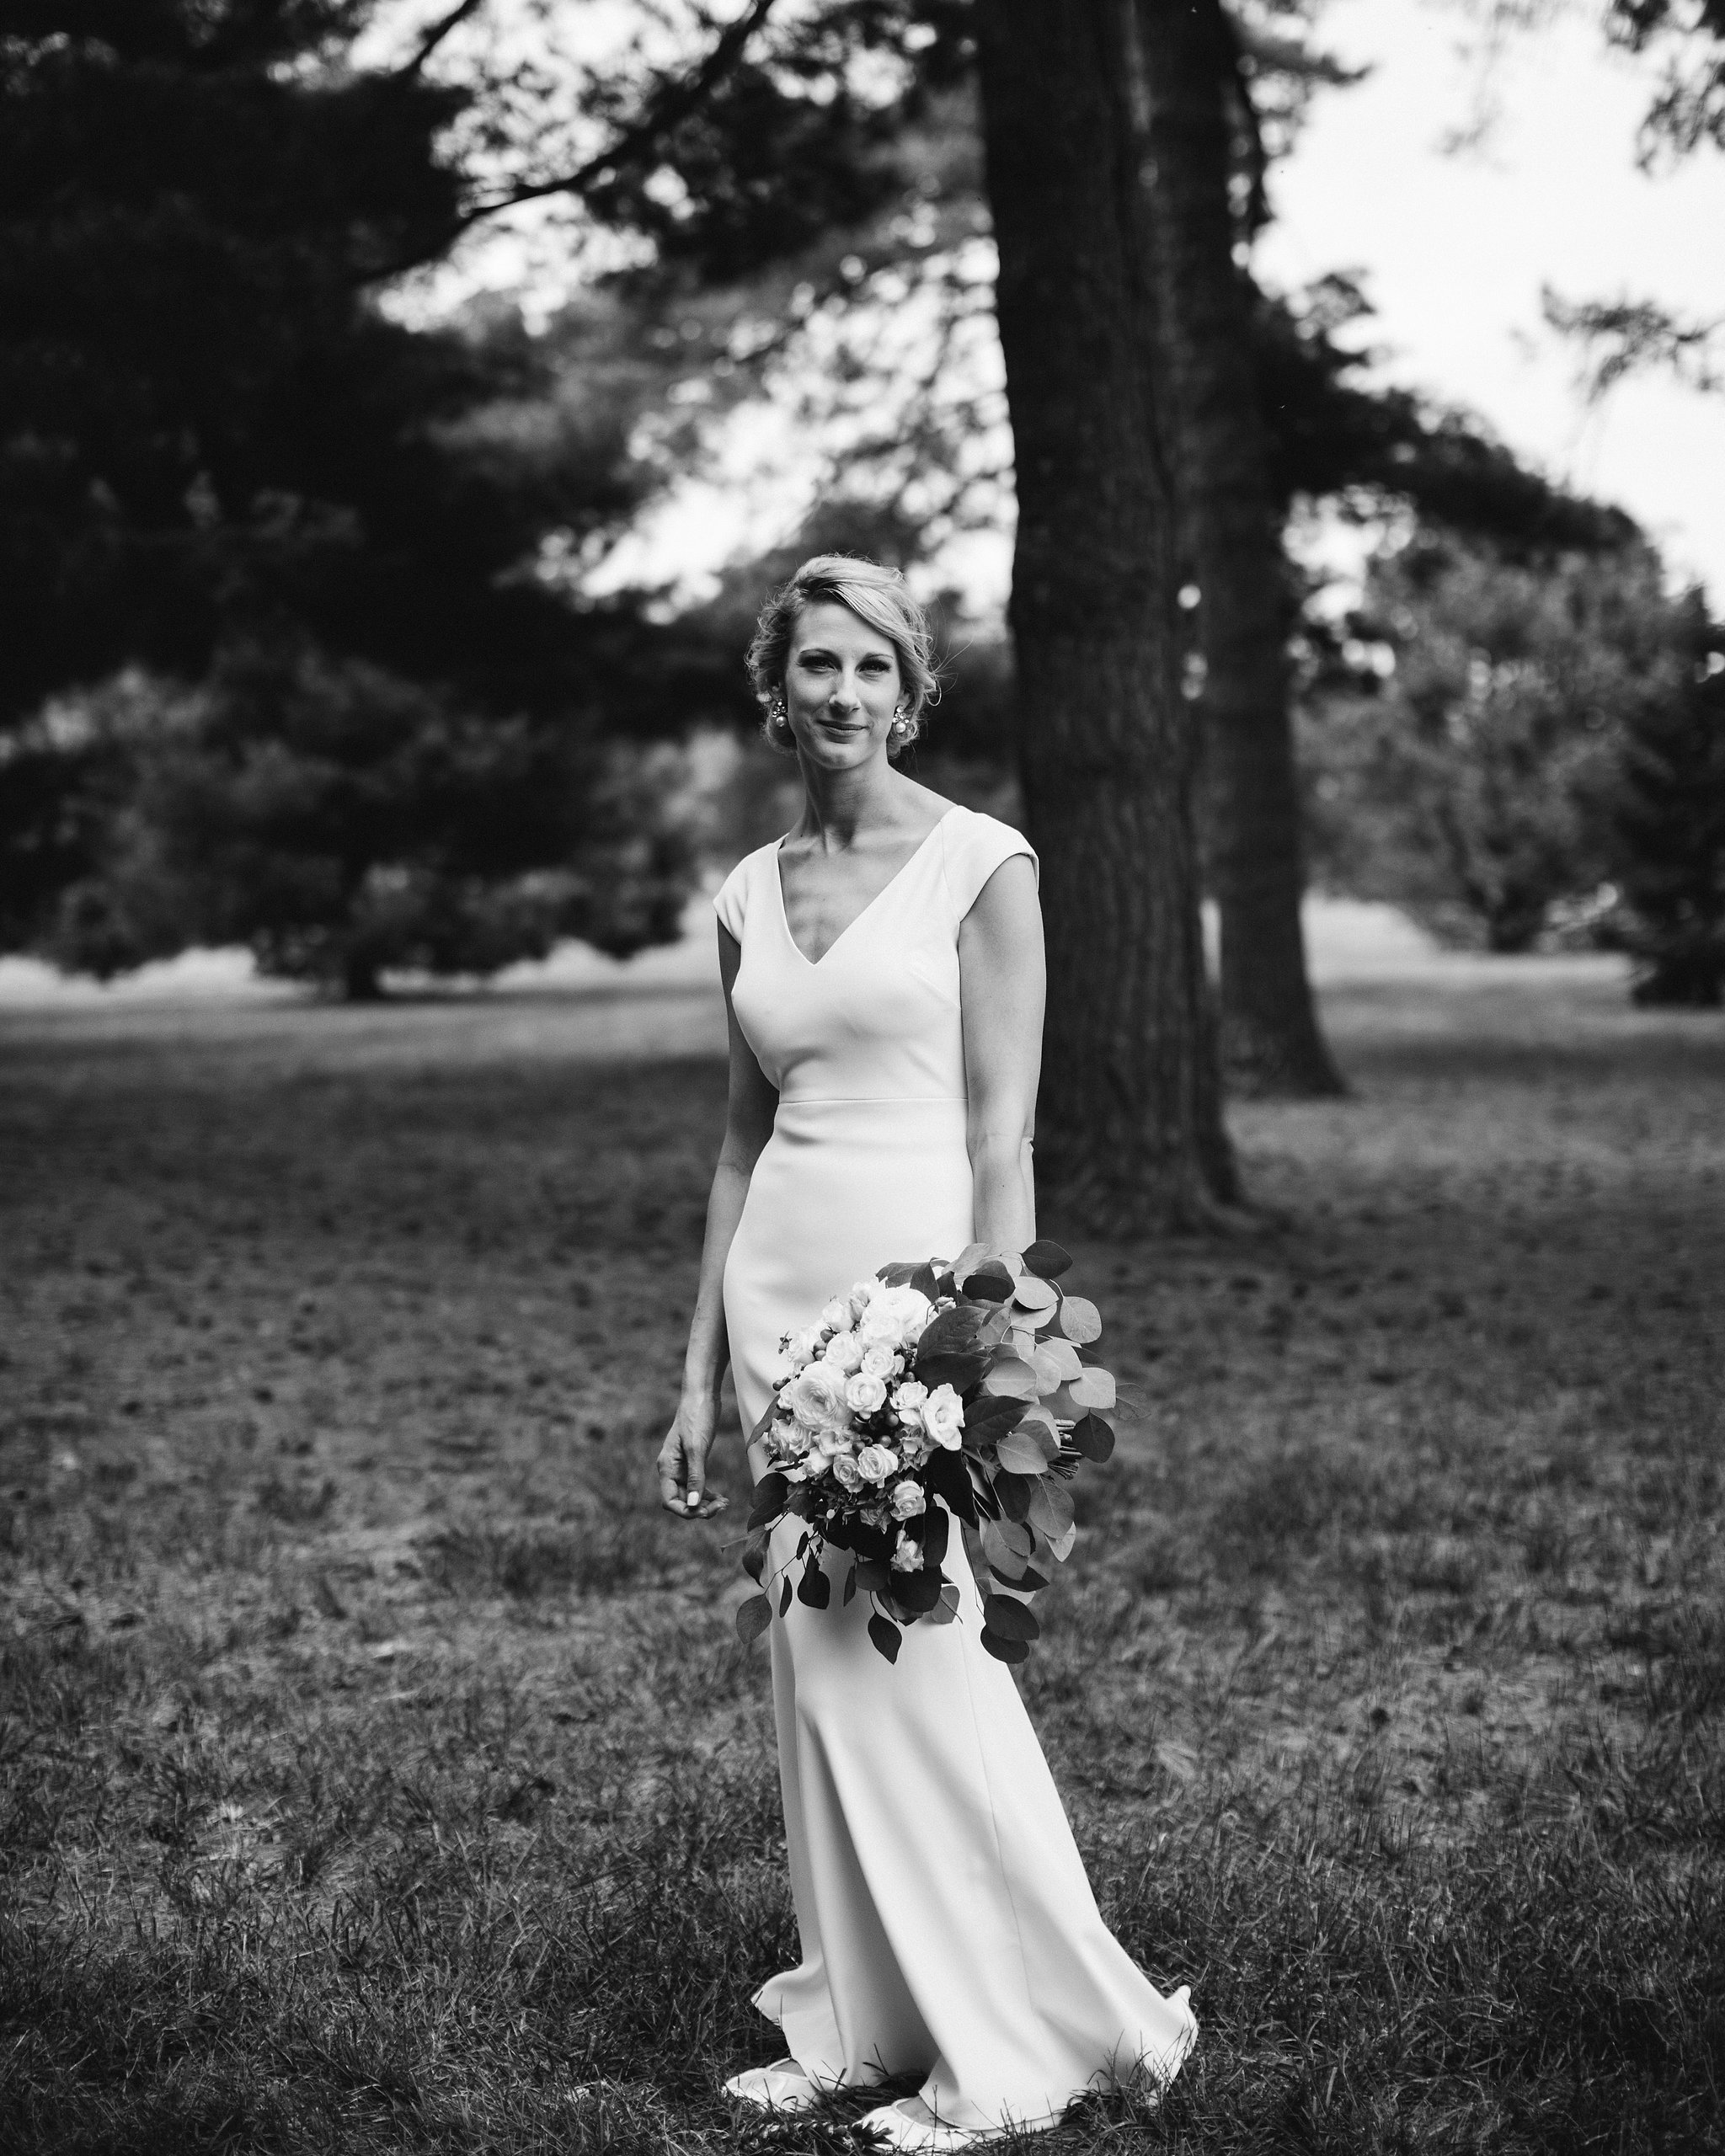 Boulevard Brewer and Brookside Backyard Spring Wedding_Kindling Wedding Photography_05.JPG